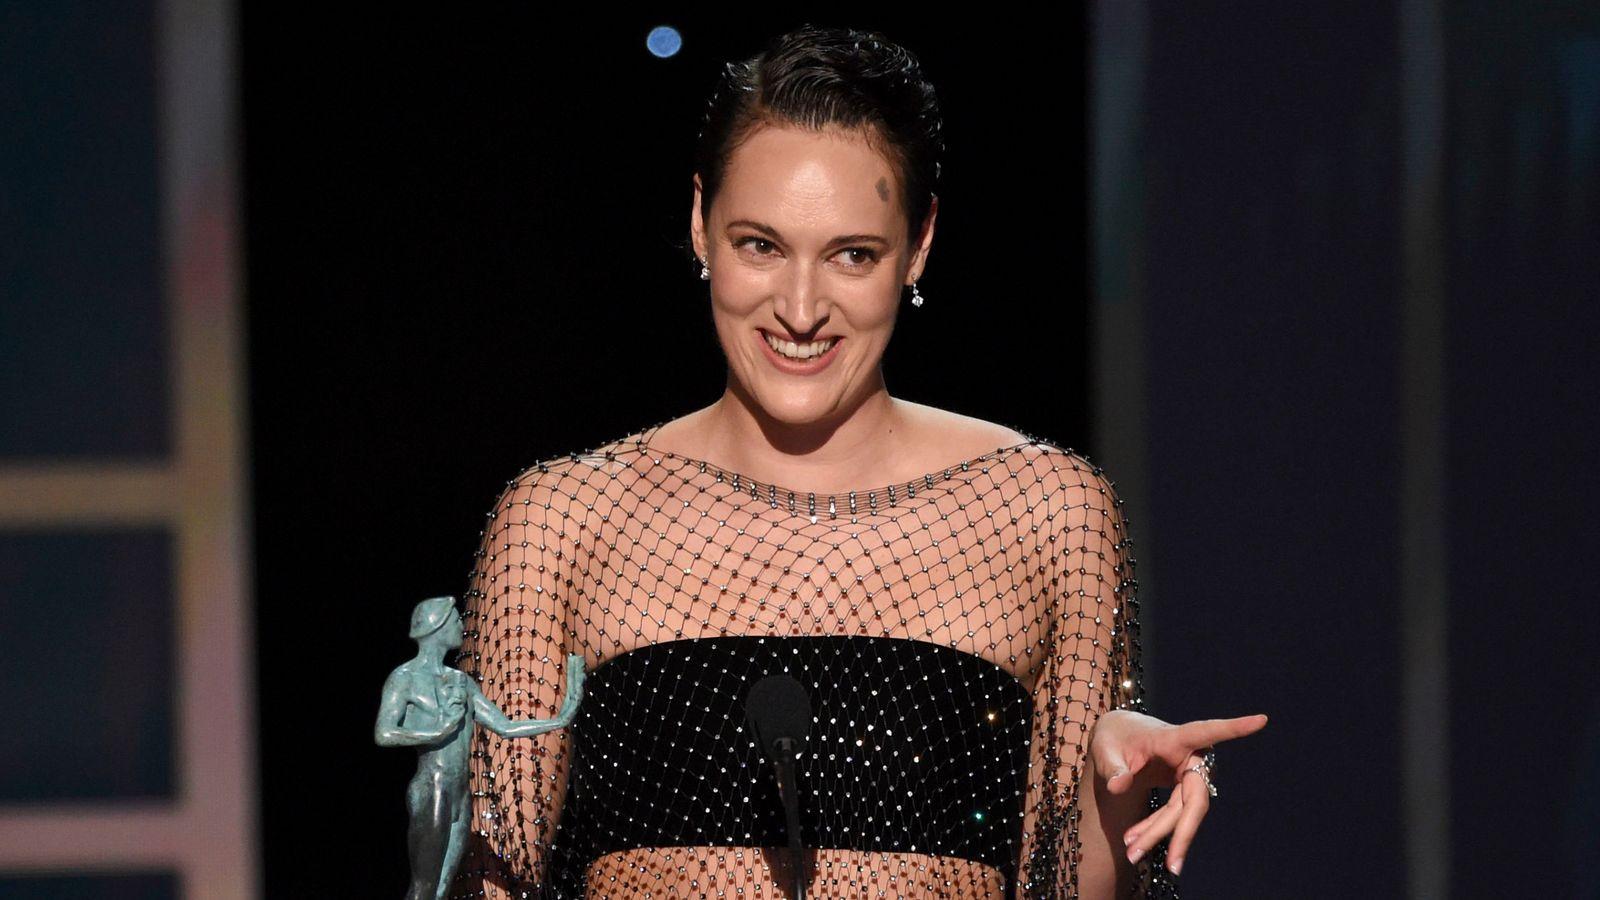 Parasite, Pitt and Waller-Bridge among winners at Screen Actors Guild Awards - Sky News